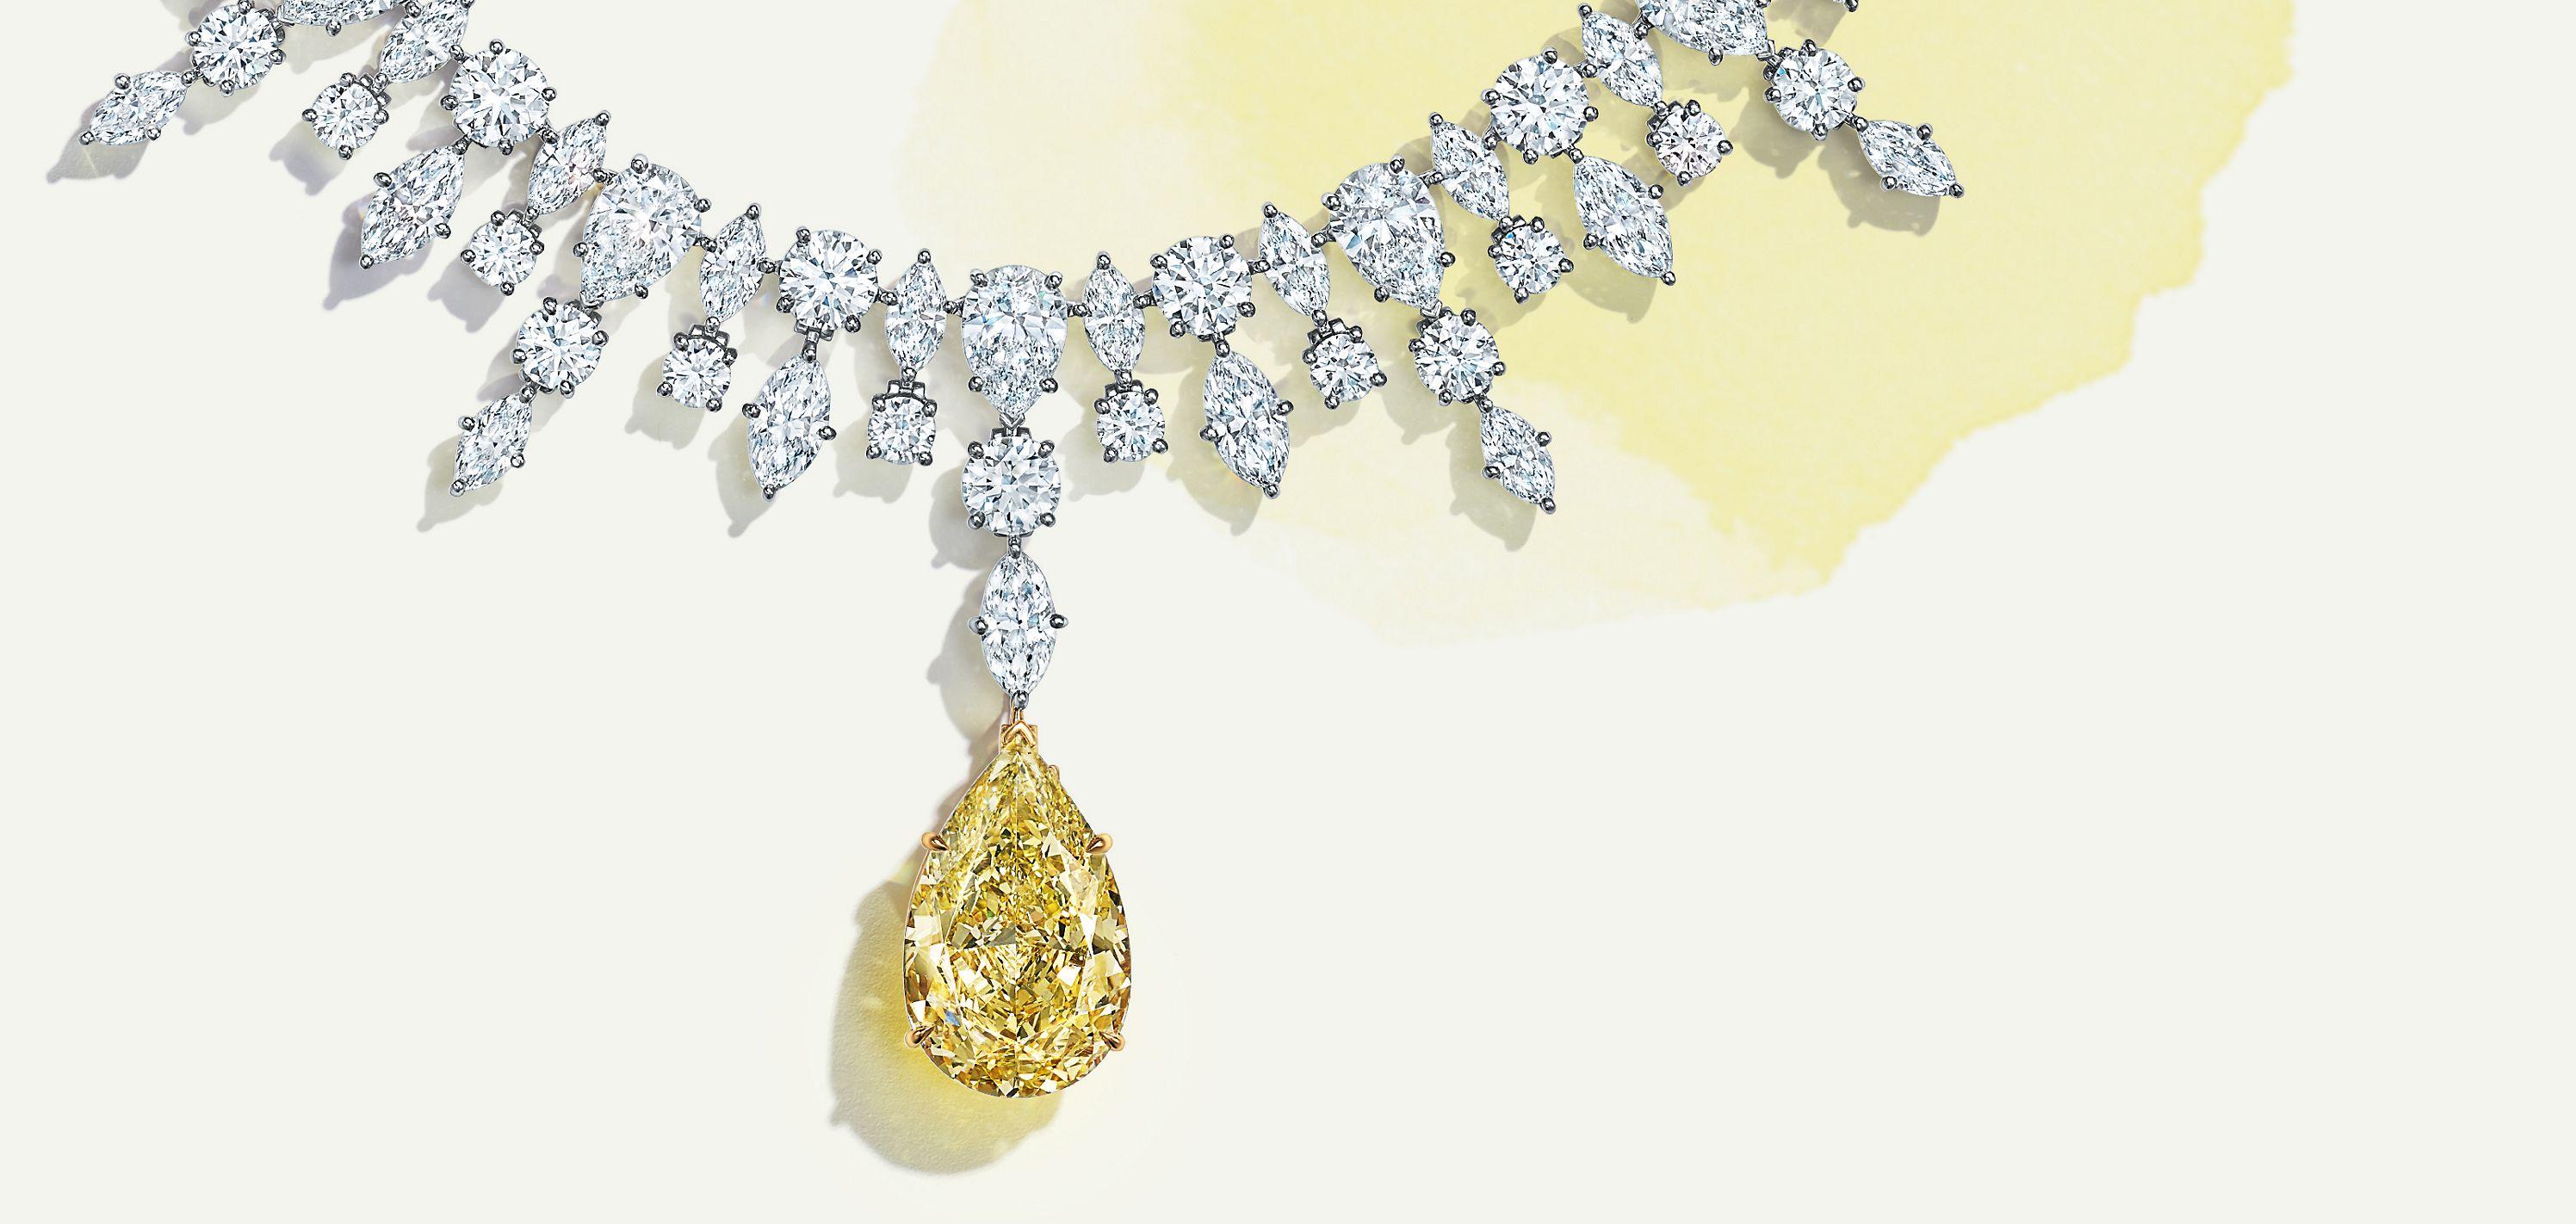 Tiffany & Co. High Jewelry